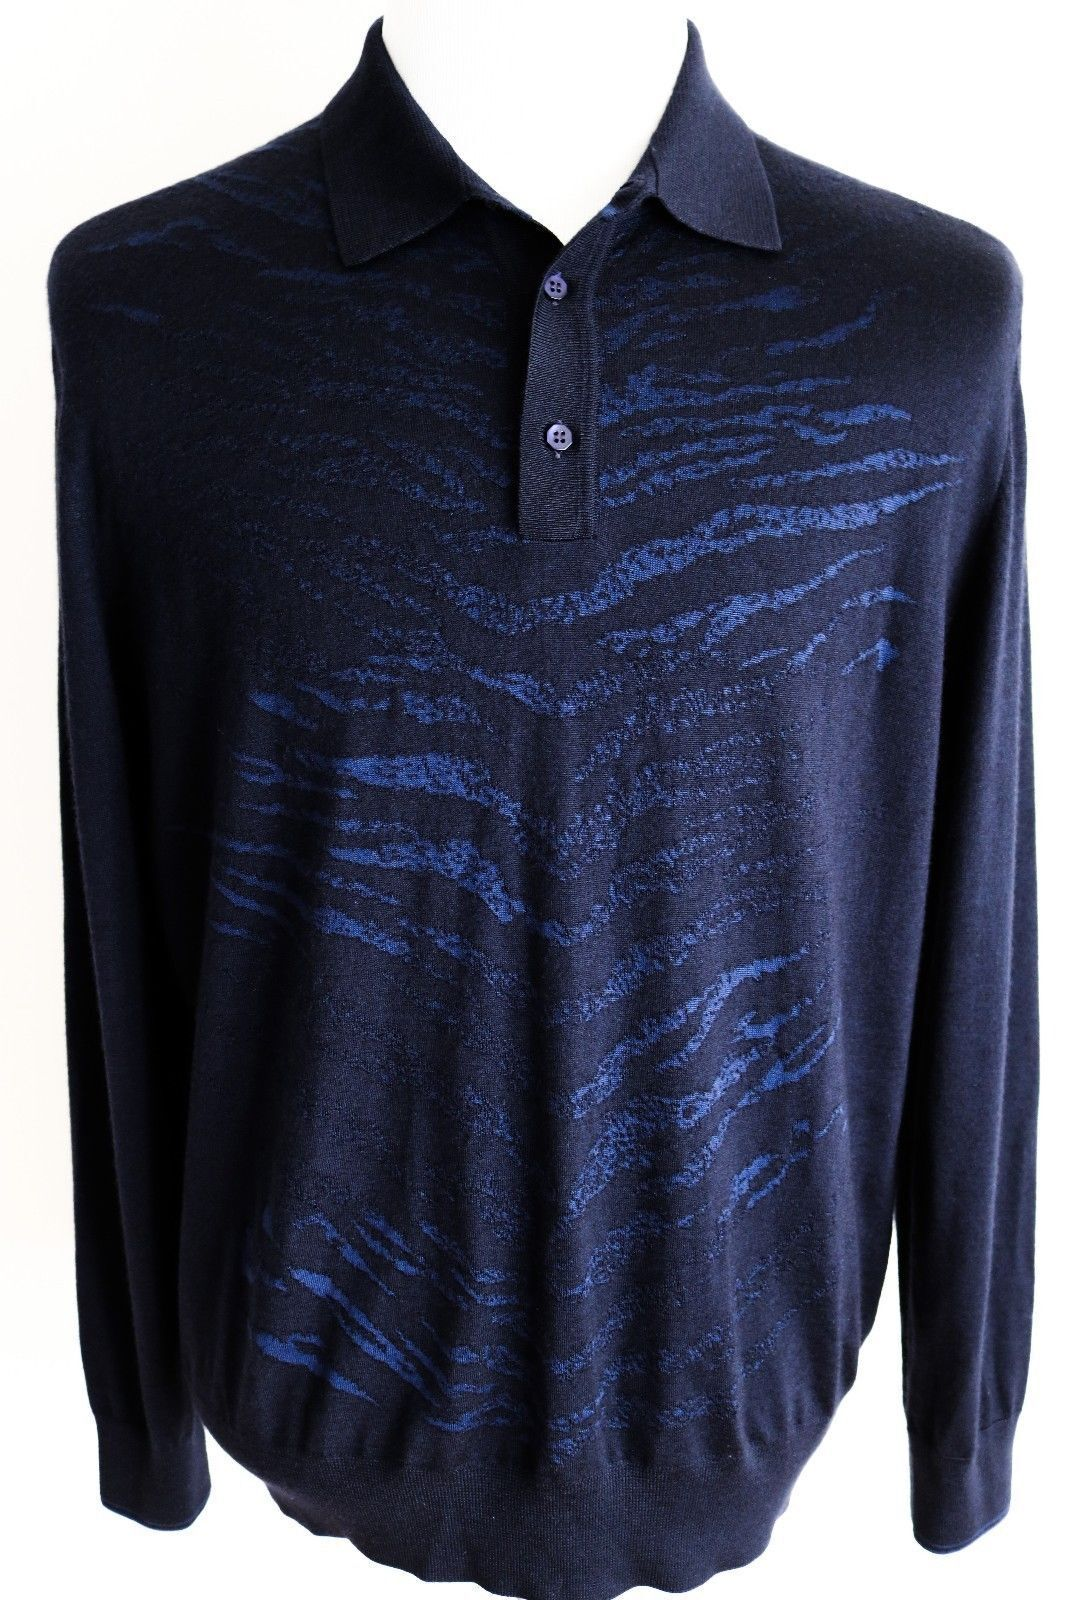 2000 STEFANO RICCI Navy and Blau Cashmere Silk Polo Sweater Größe 56 Euro 2XL